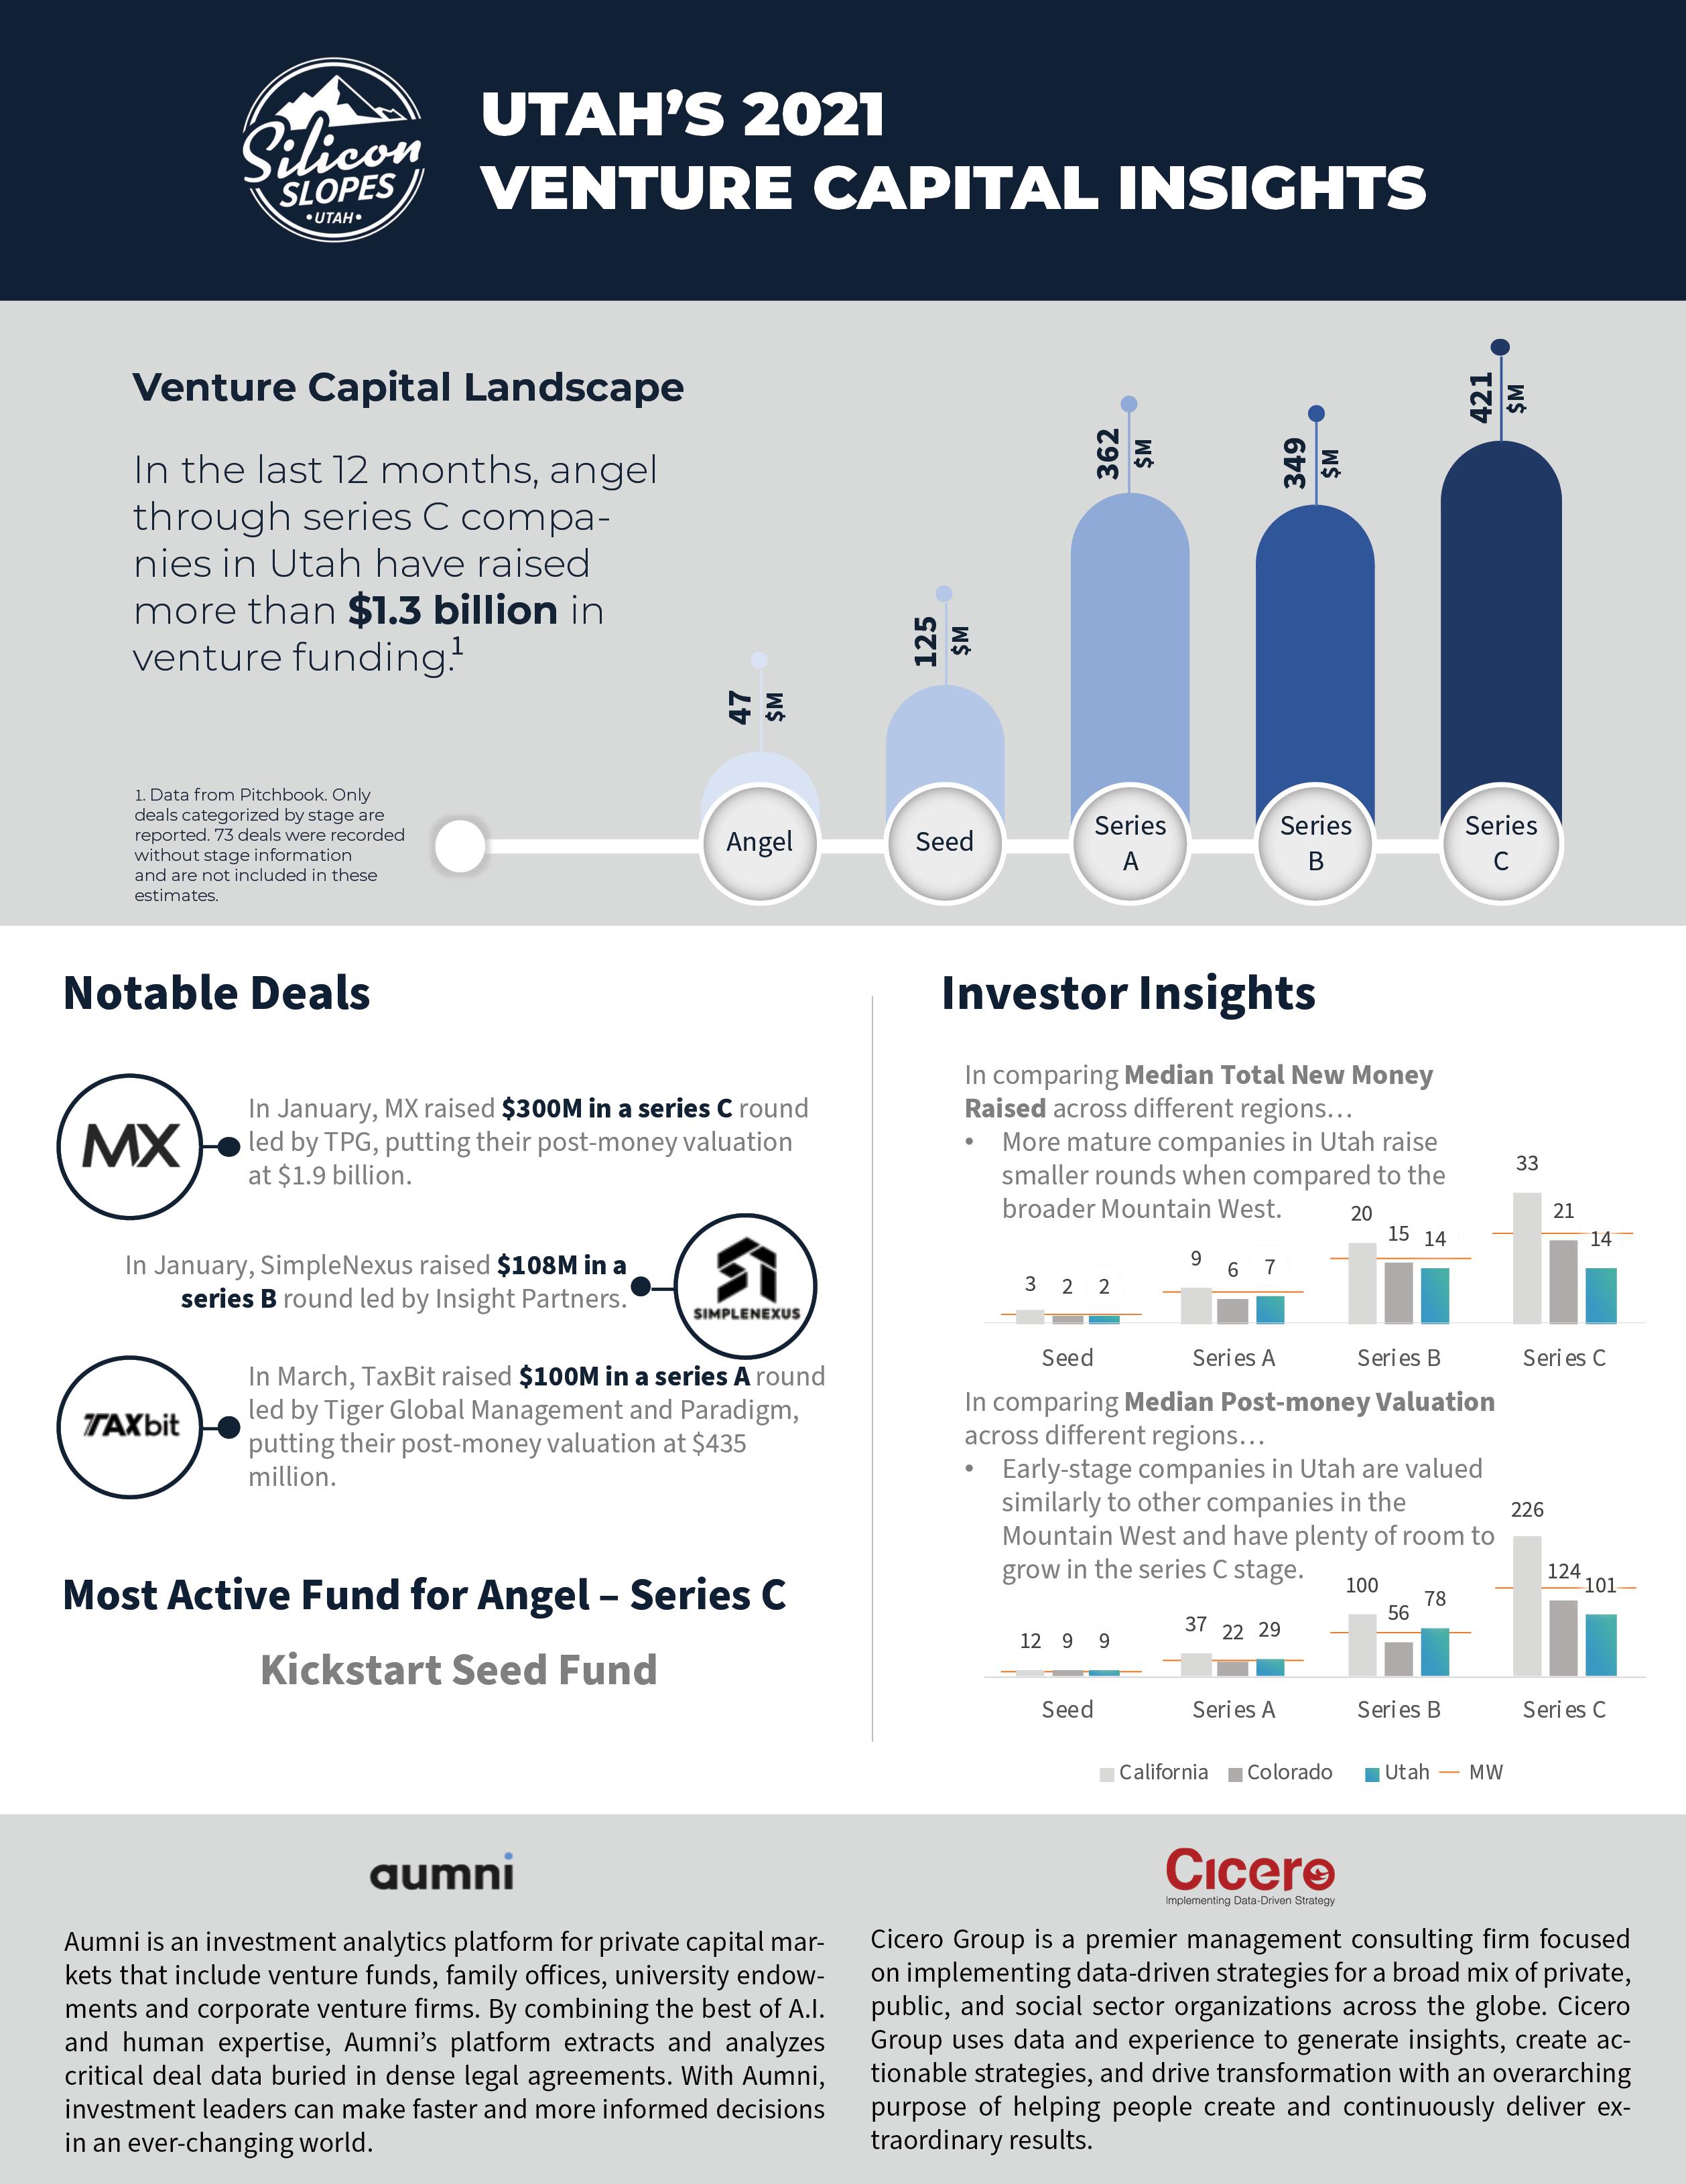 Utah's 2021 Venture Capital Insights